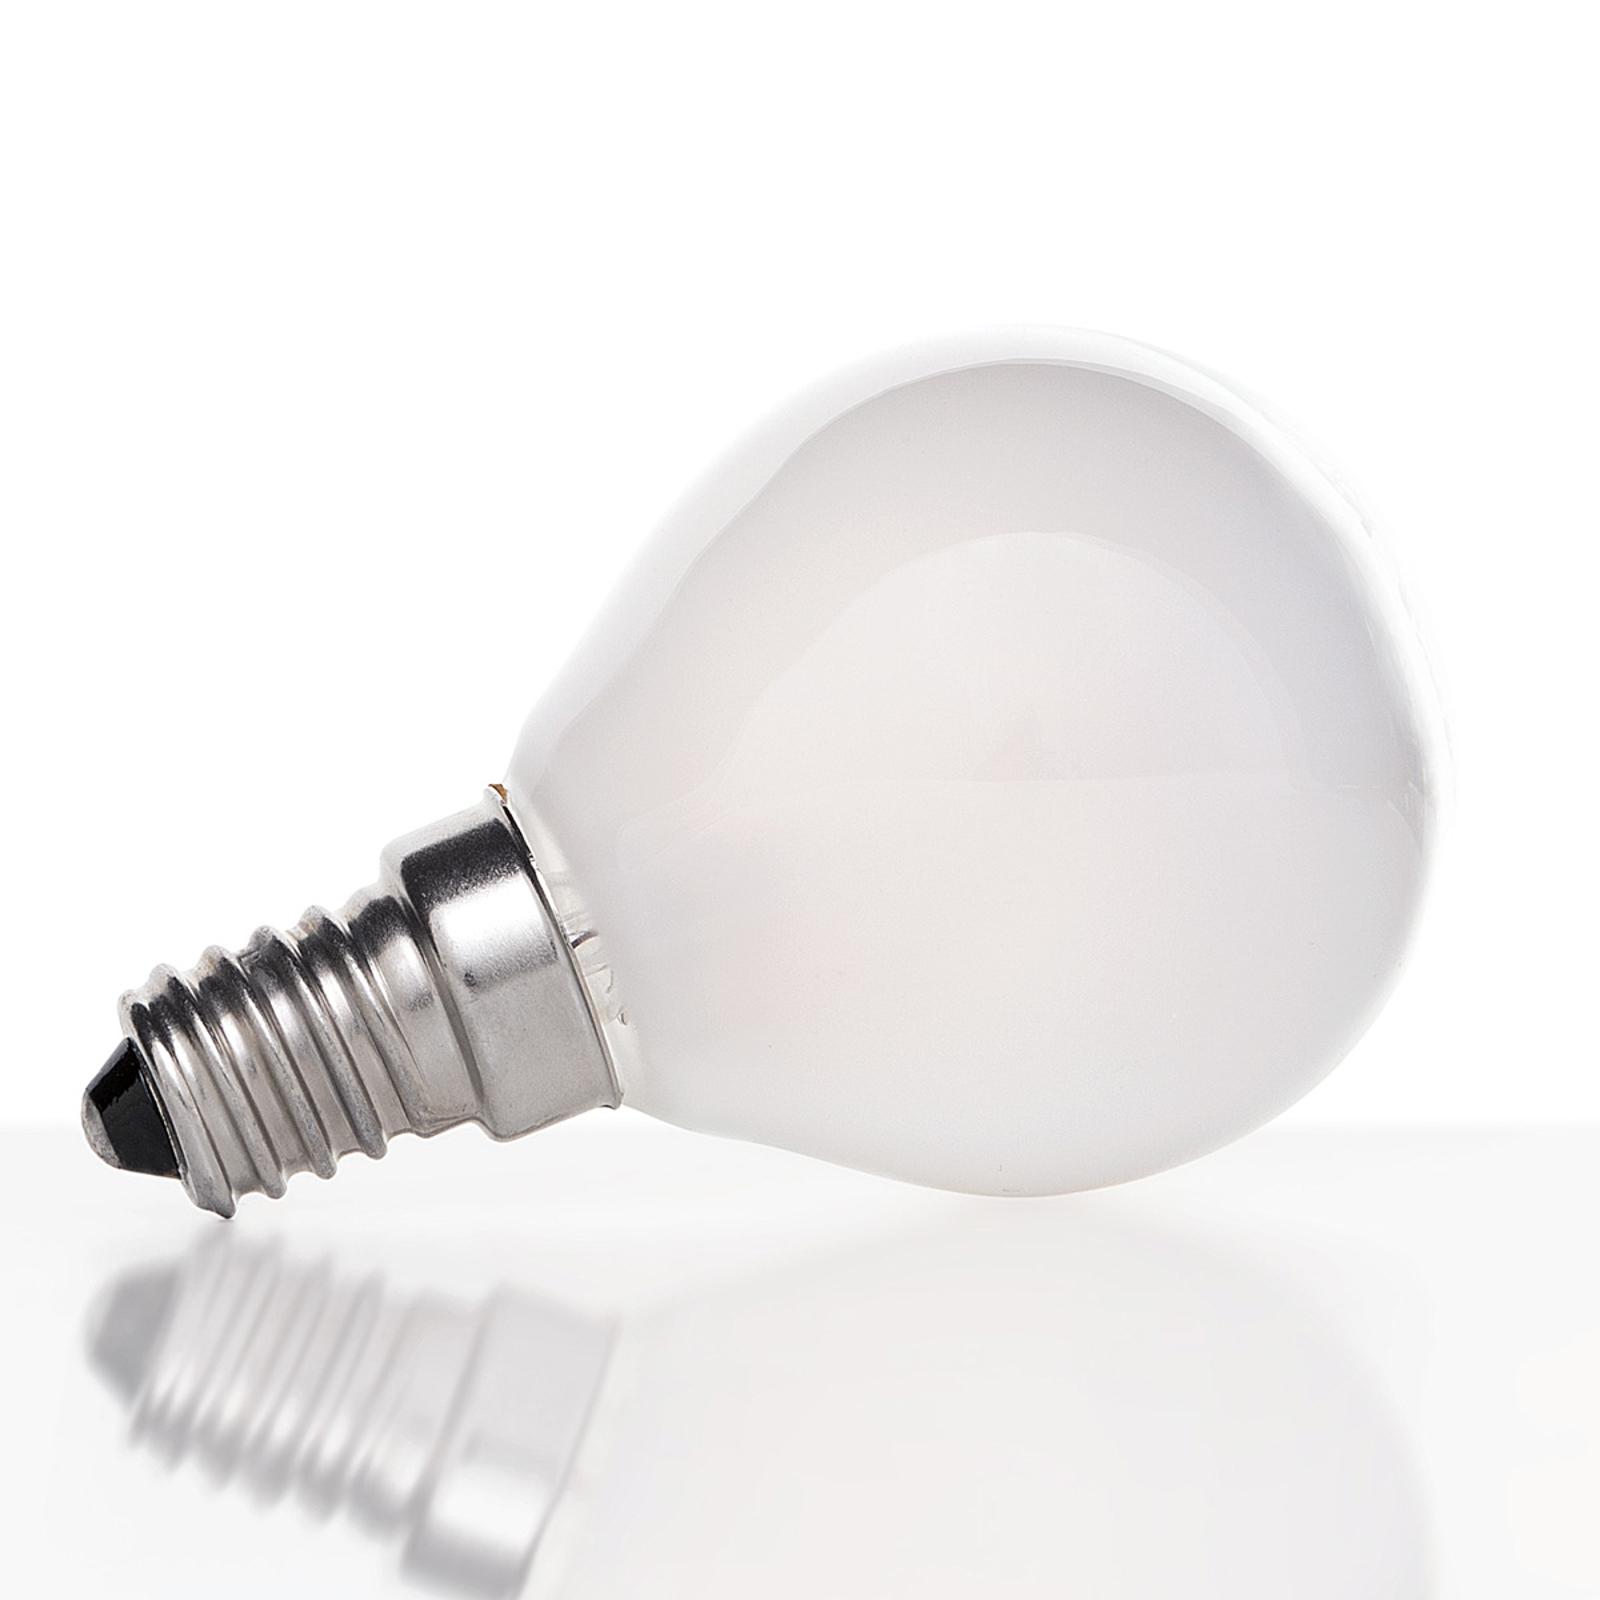 LED-dropplampa E14 4W 827, matt insida